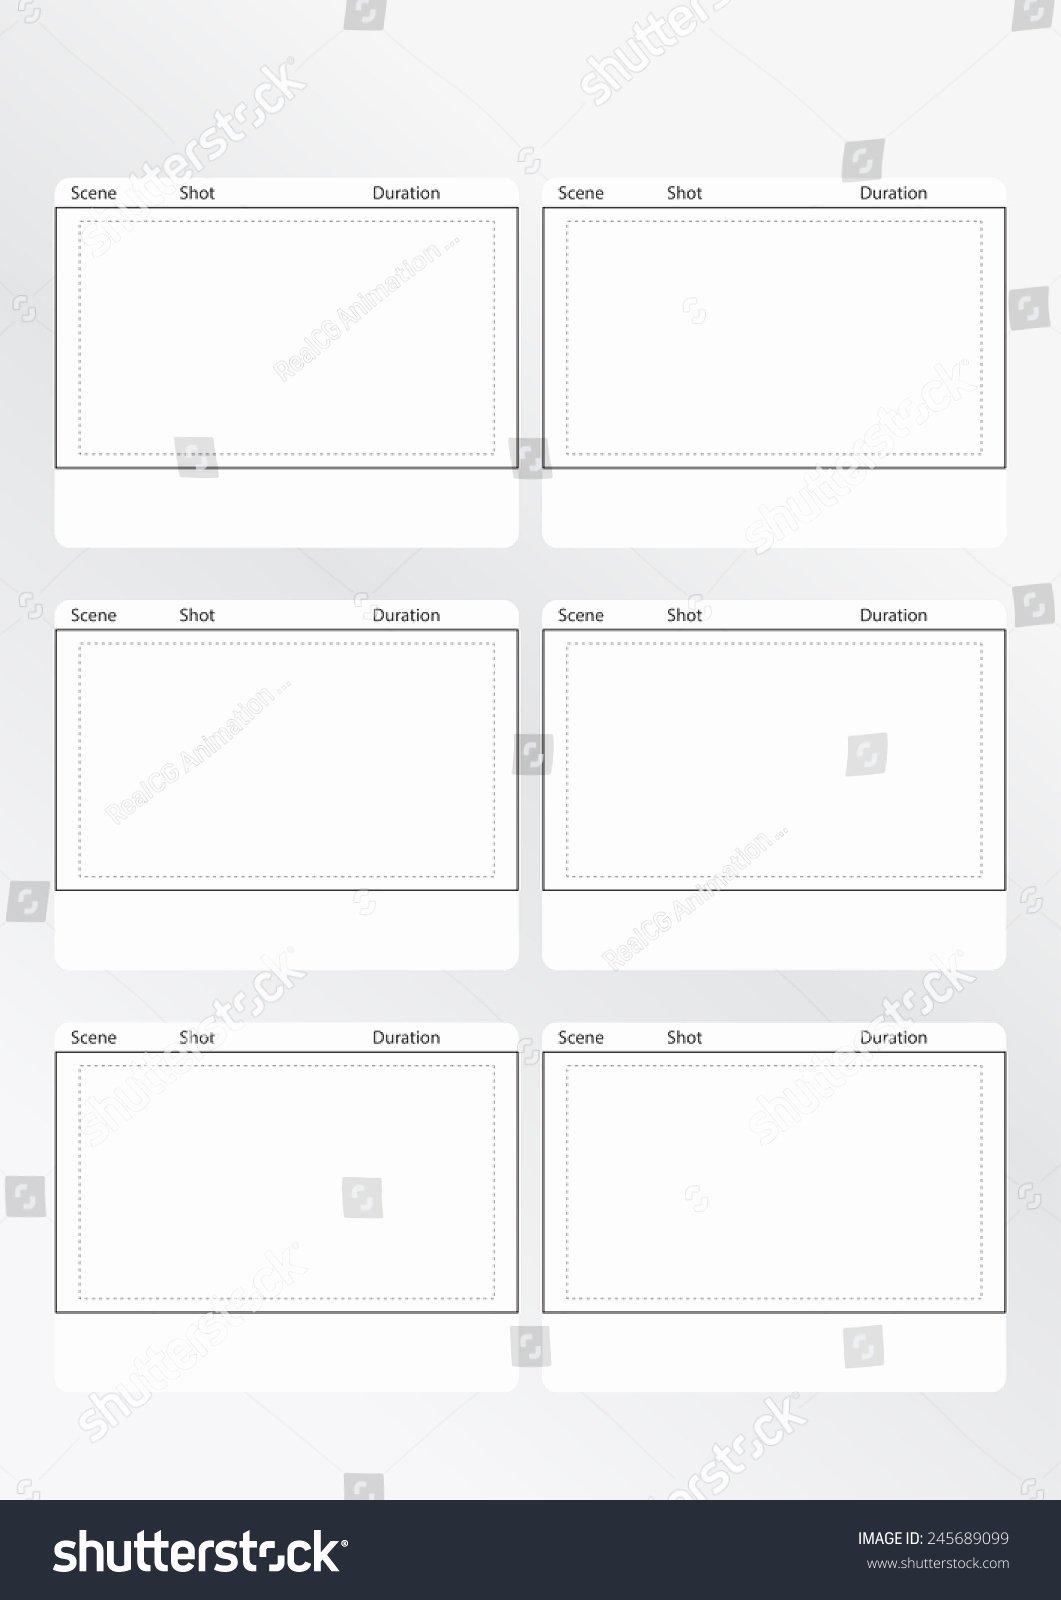 Professional Film Storyboard Template Fresh Professional Storyboard Template Easy Present Stock